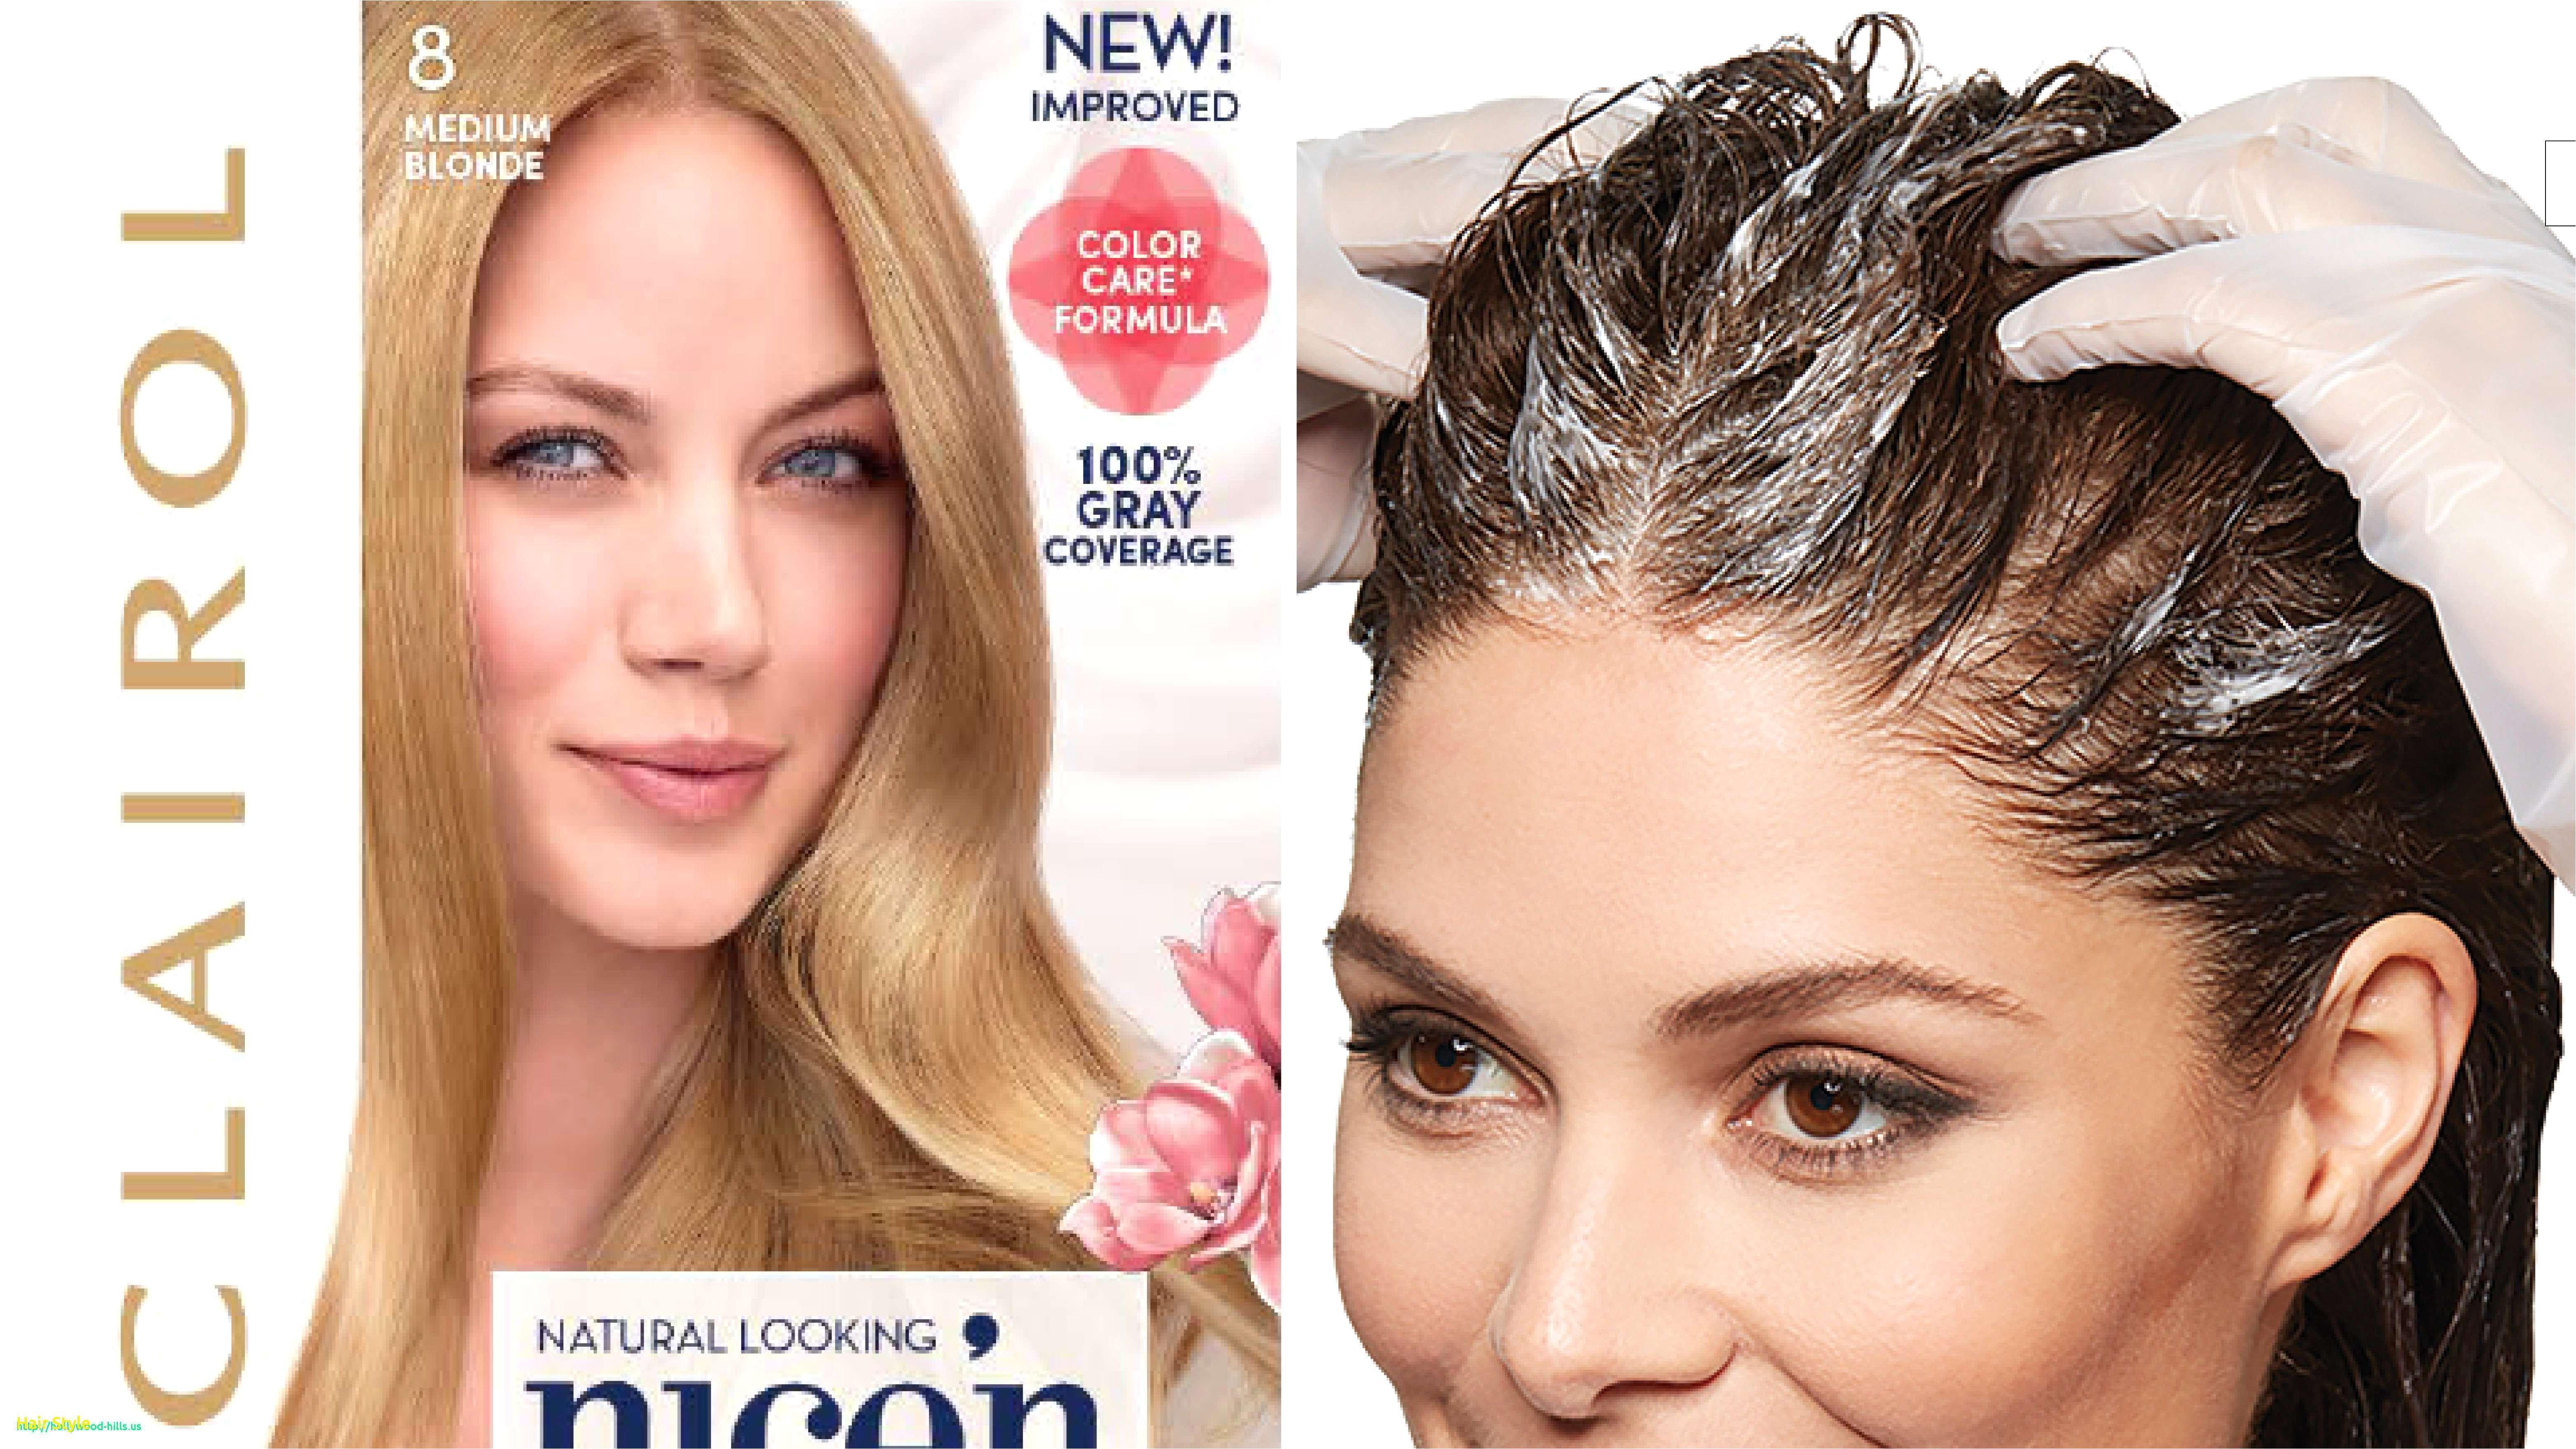 easy 90s hairstyles hair dye styles beautiful i pinimg 1200x 0d 60 8a 0d608a58a4bb3ed3b as well